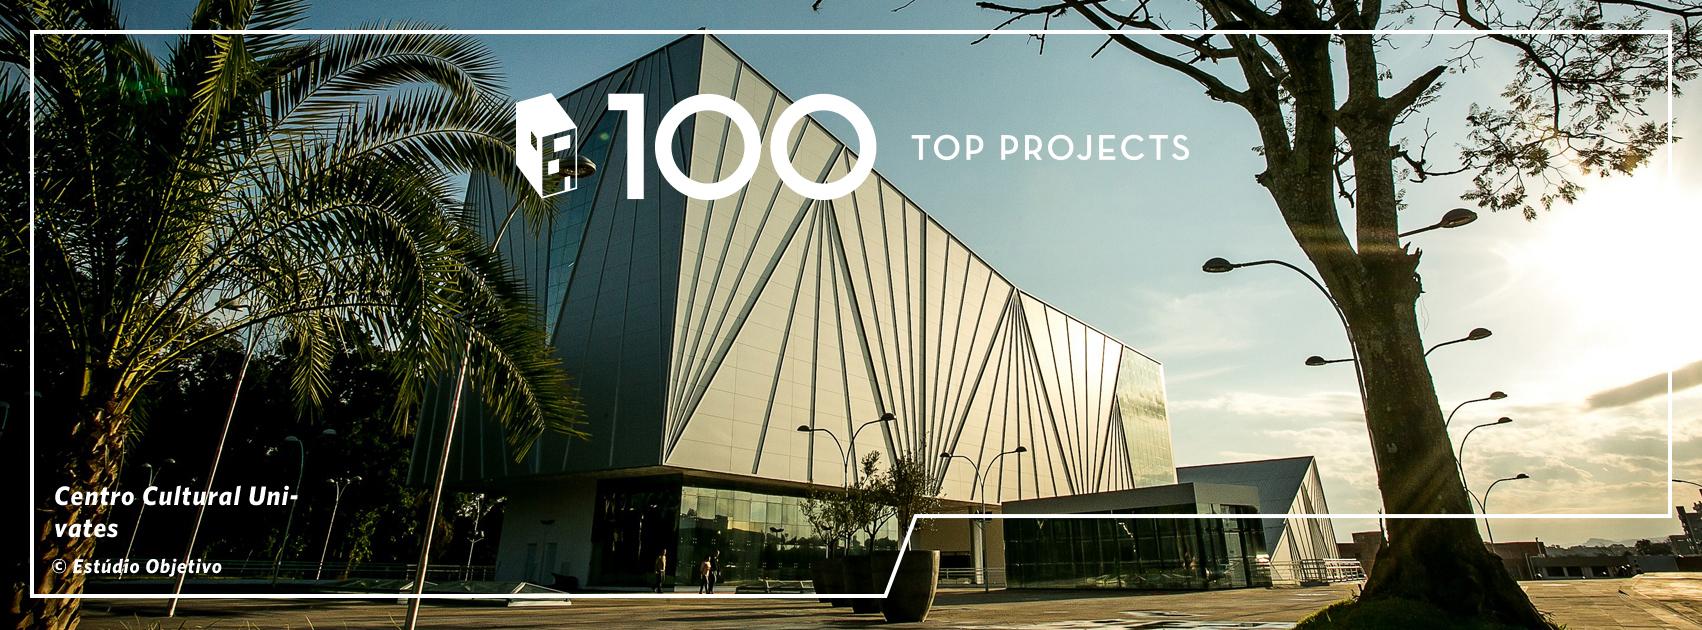 Galeria de Top 100 projetos brasileiros - 7